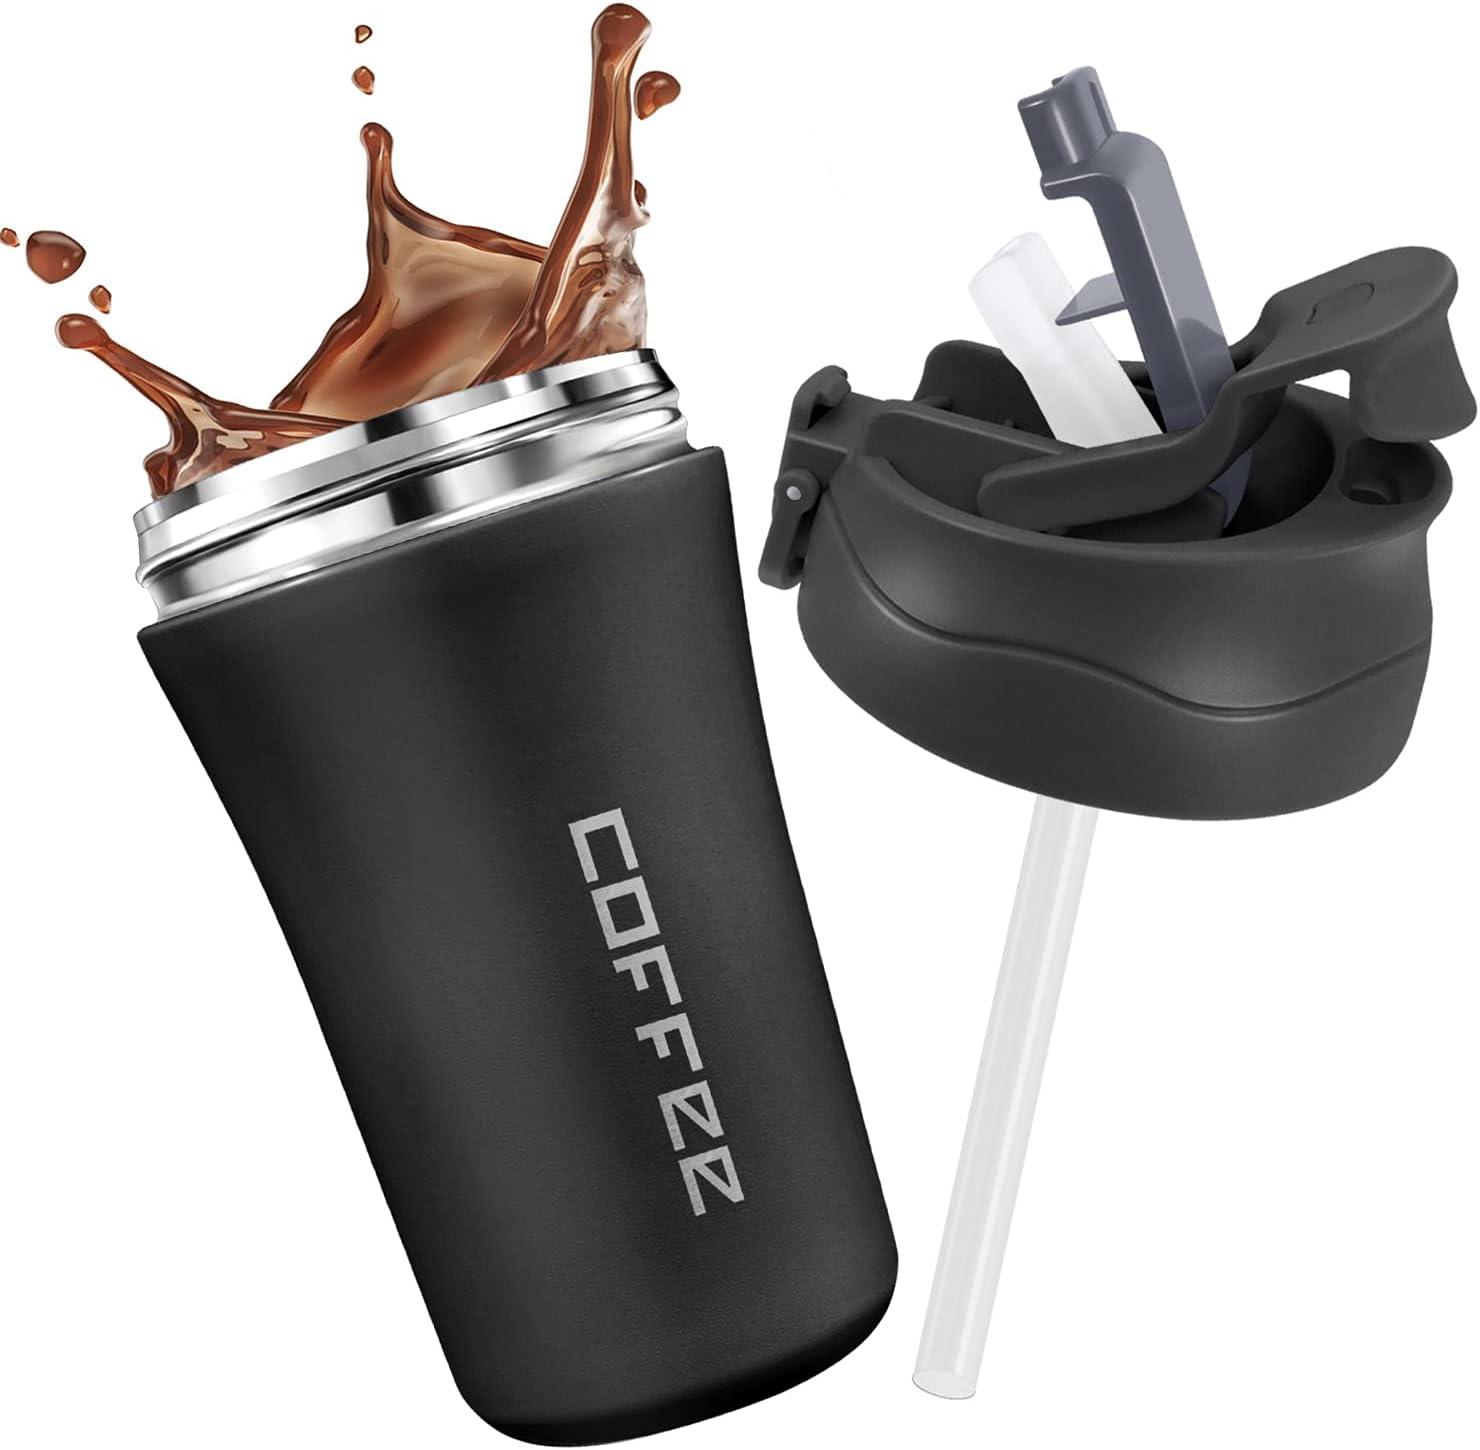 JEEZAO Taza Termico de Café 400 ml,Vaso Termo de Viaje con Pajita,Acero Inoxidable Pared Doble Aislamiento,Prueba de Fugas,Sin BPA (Negro)